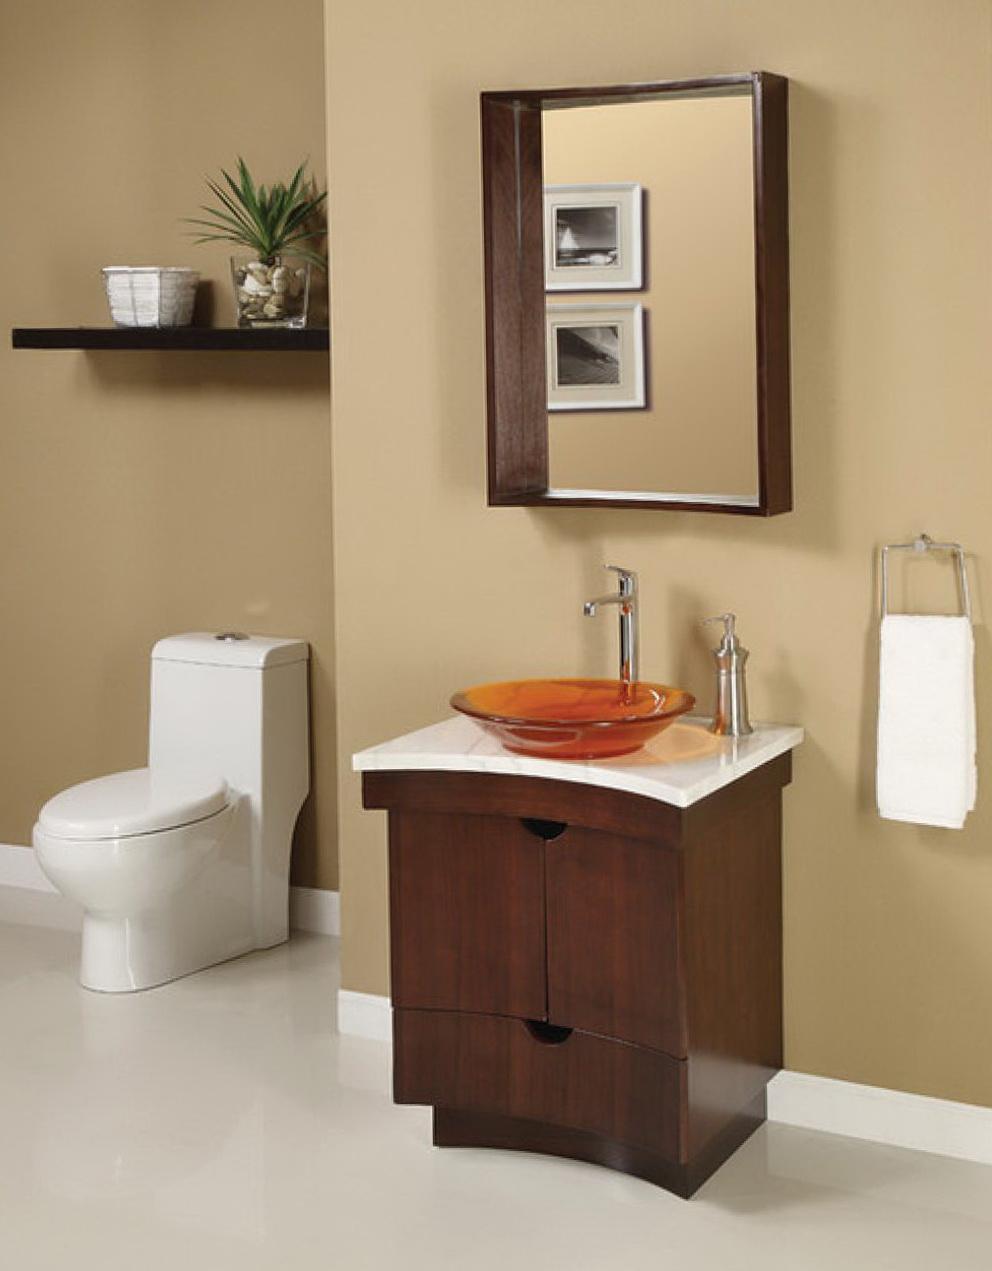 Small Bathroom Vanity Decorating Ideas